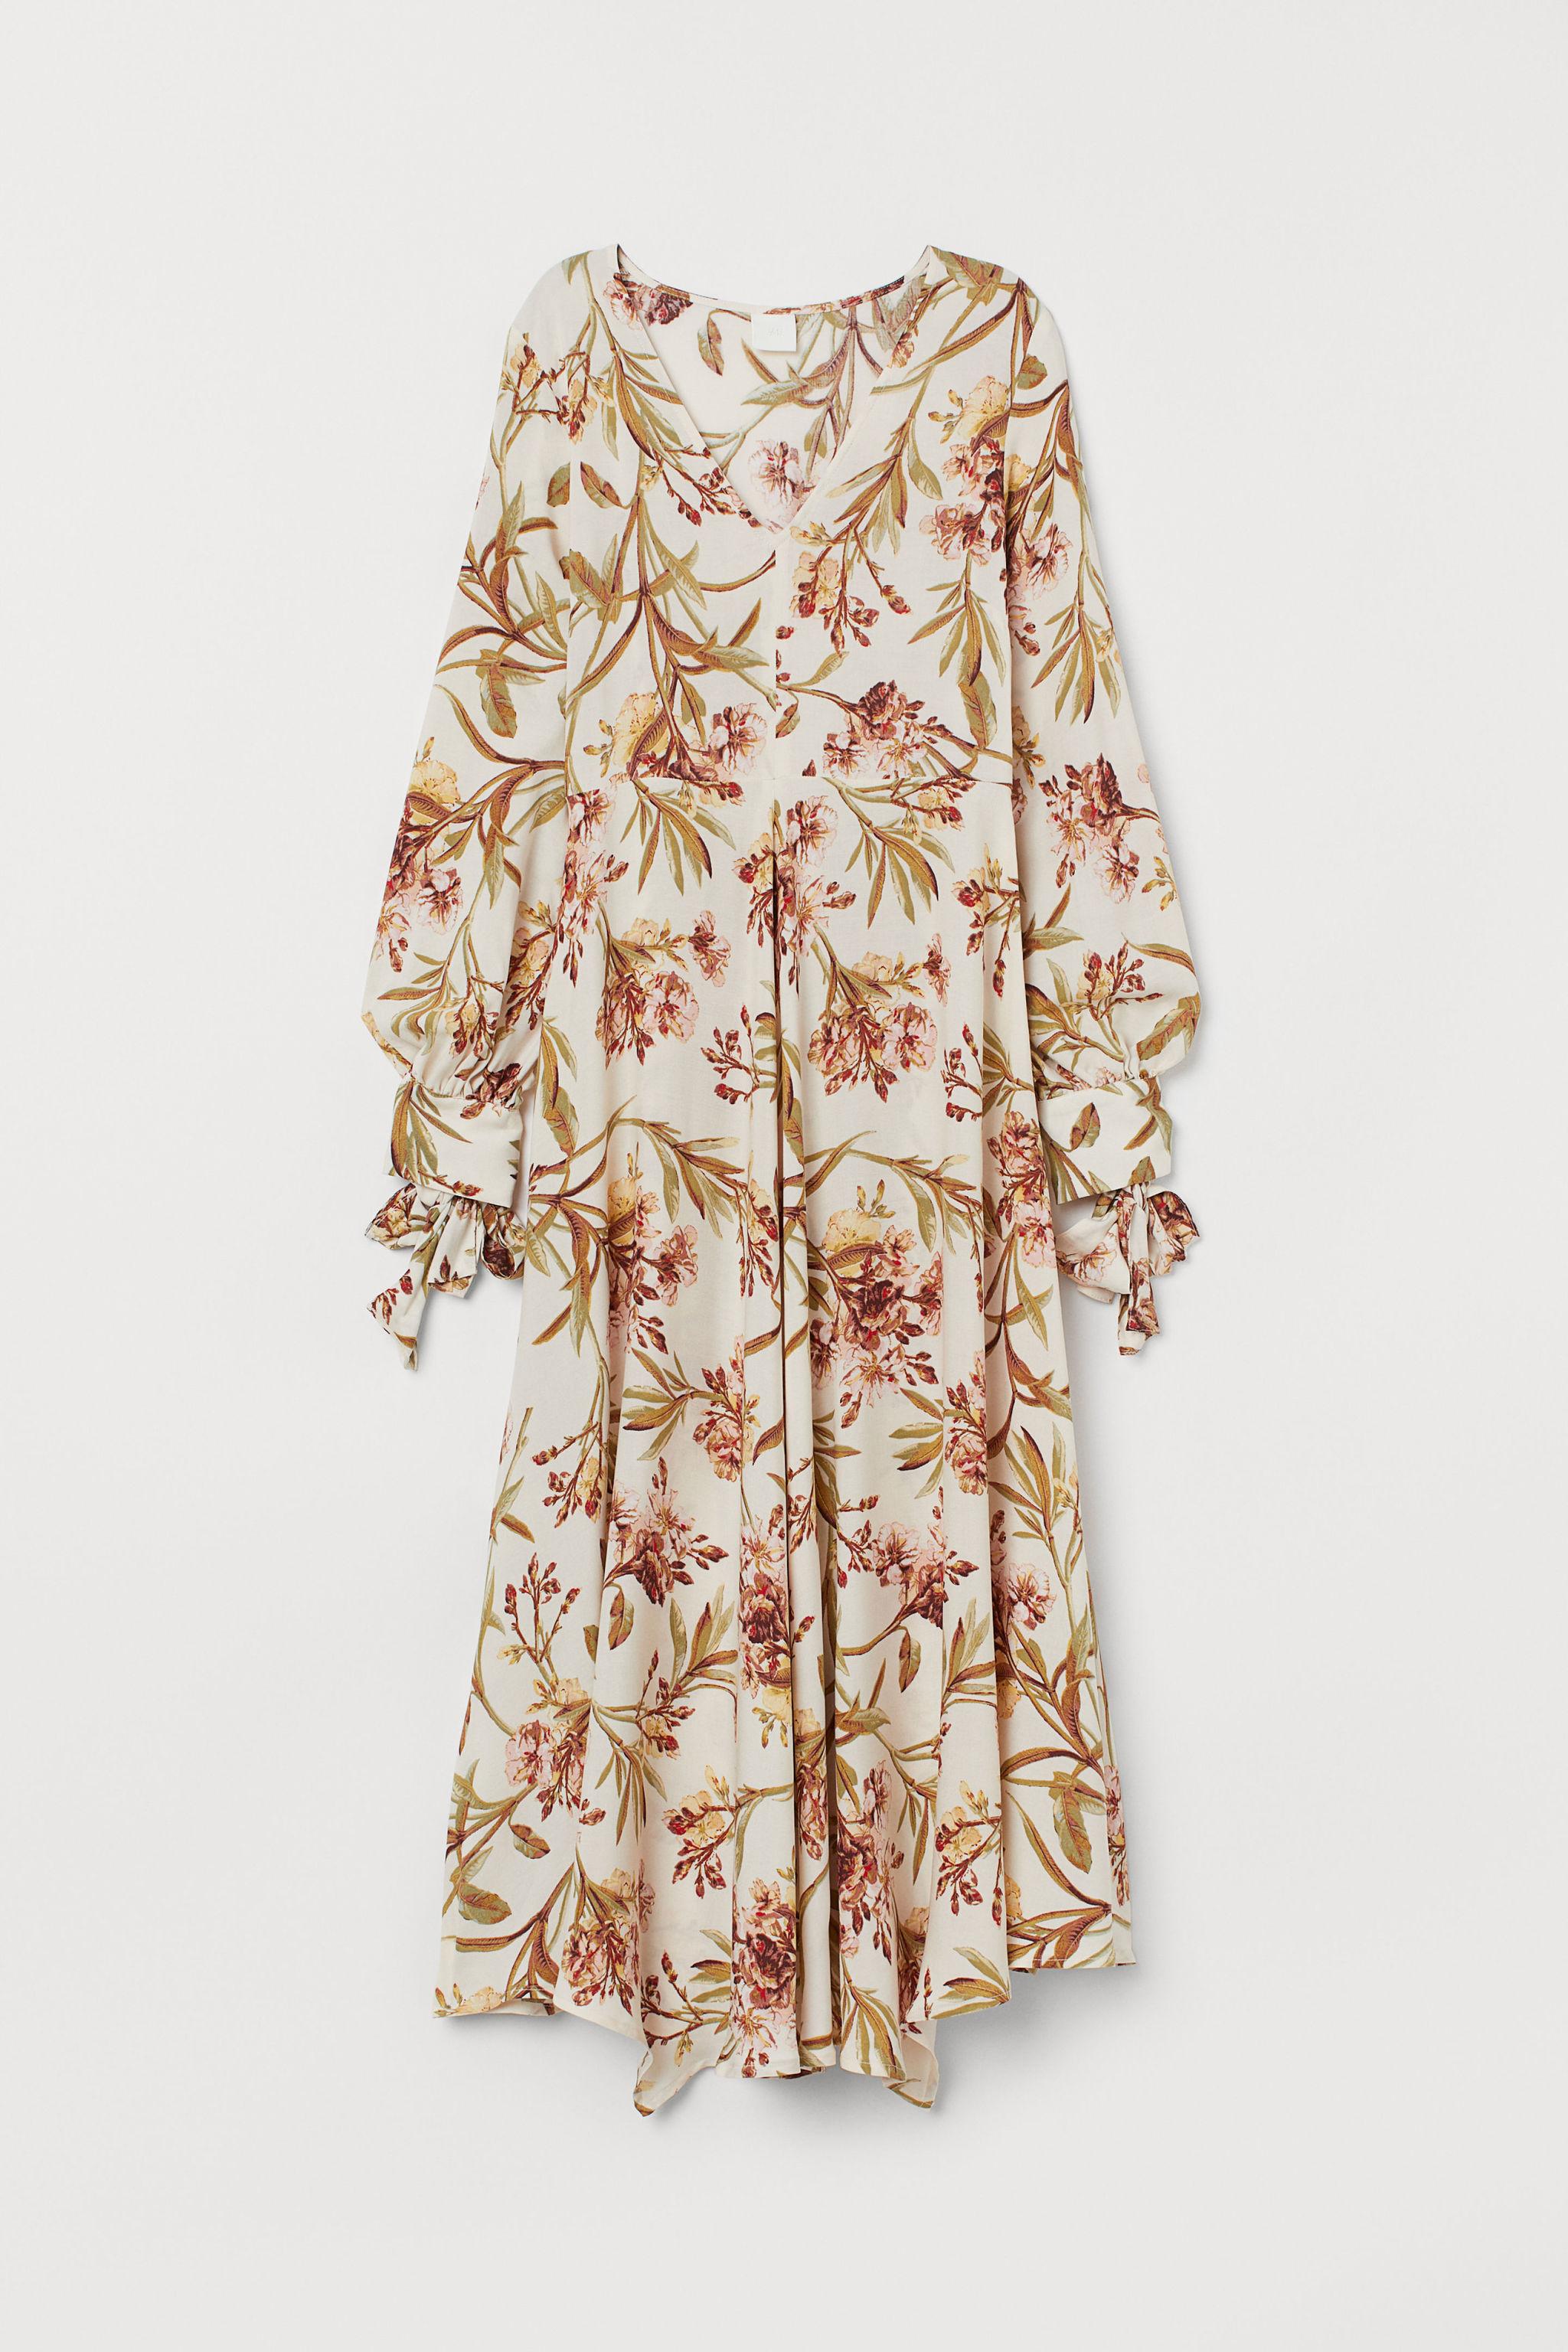 Vestido con escote de pico, de H&M (29,99 euros).